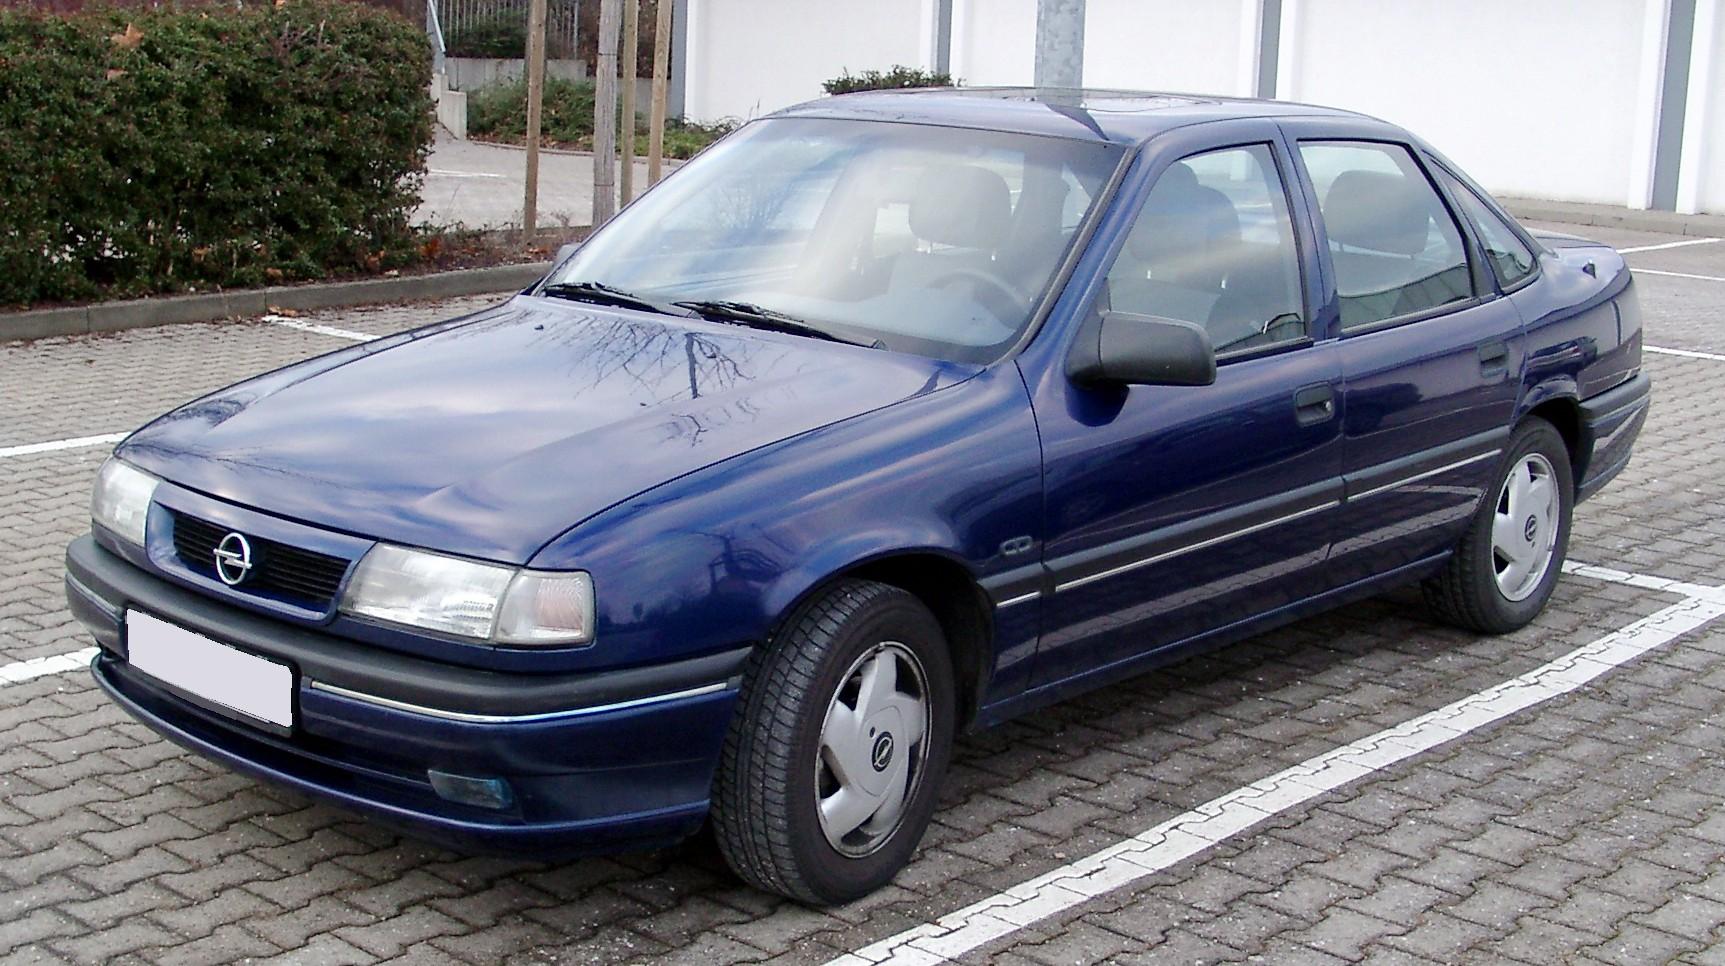 37d0aa73a9f Opel Vectra - Wikipedia